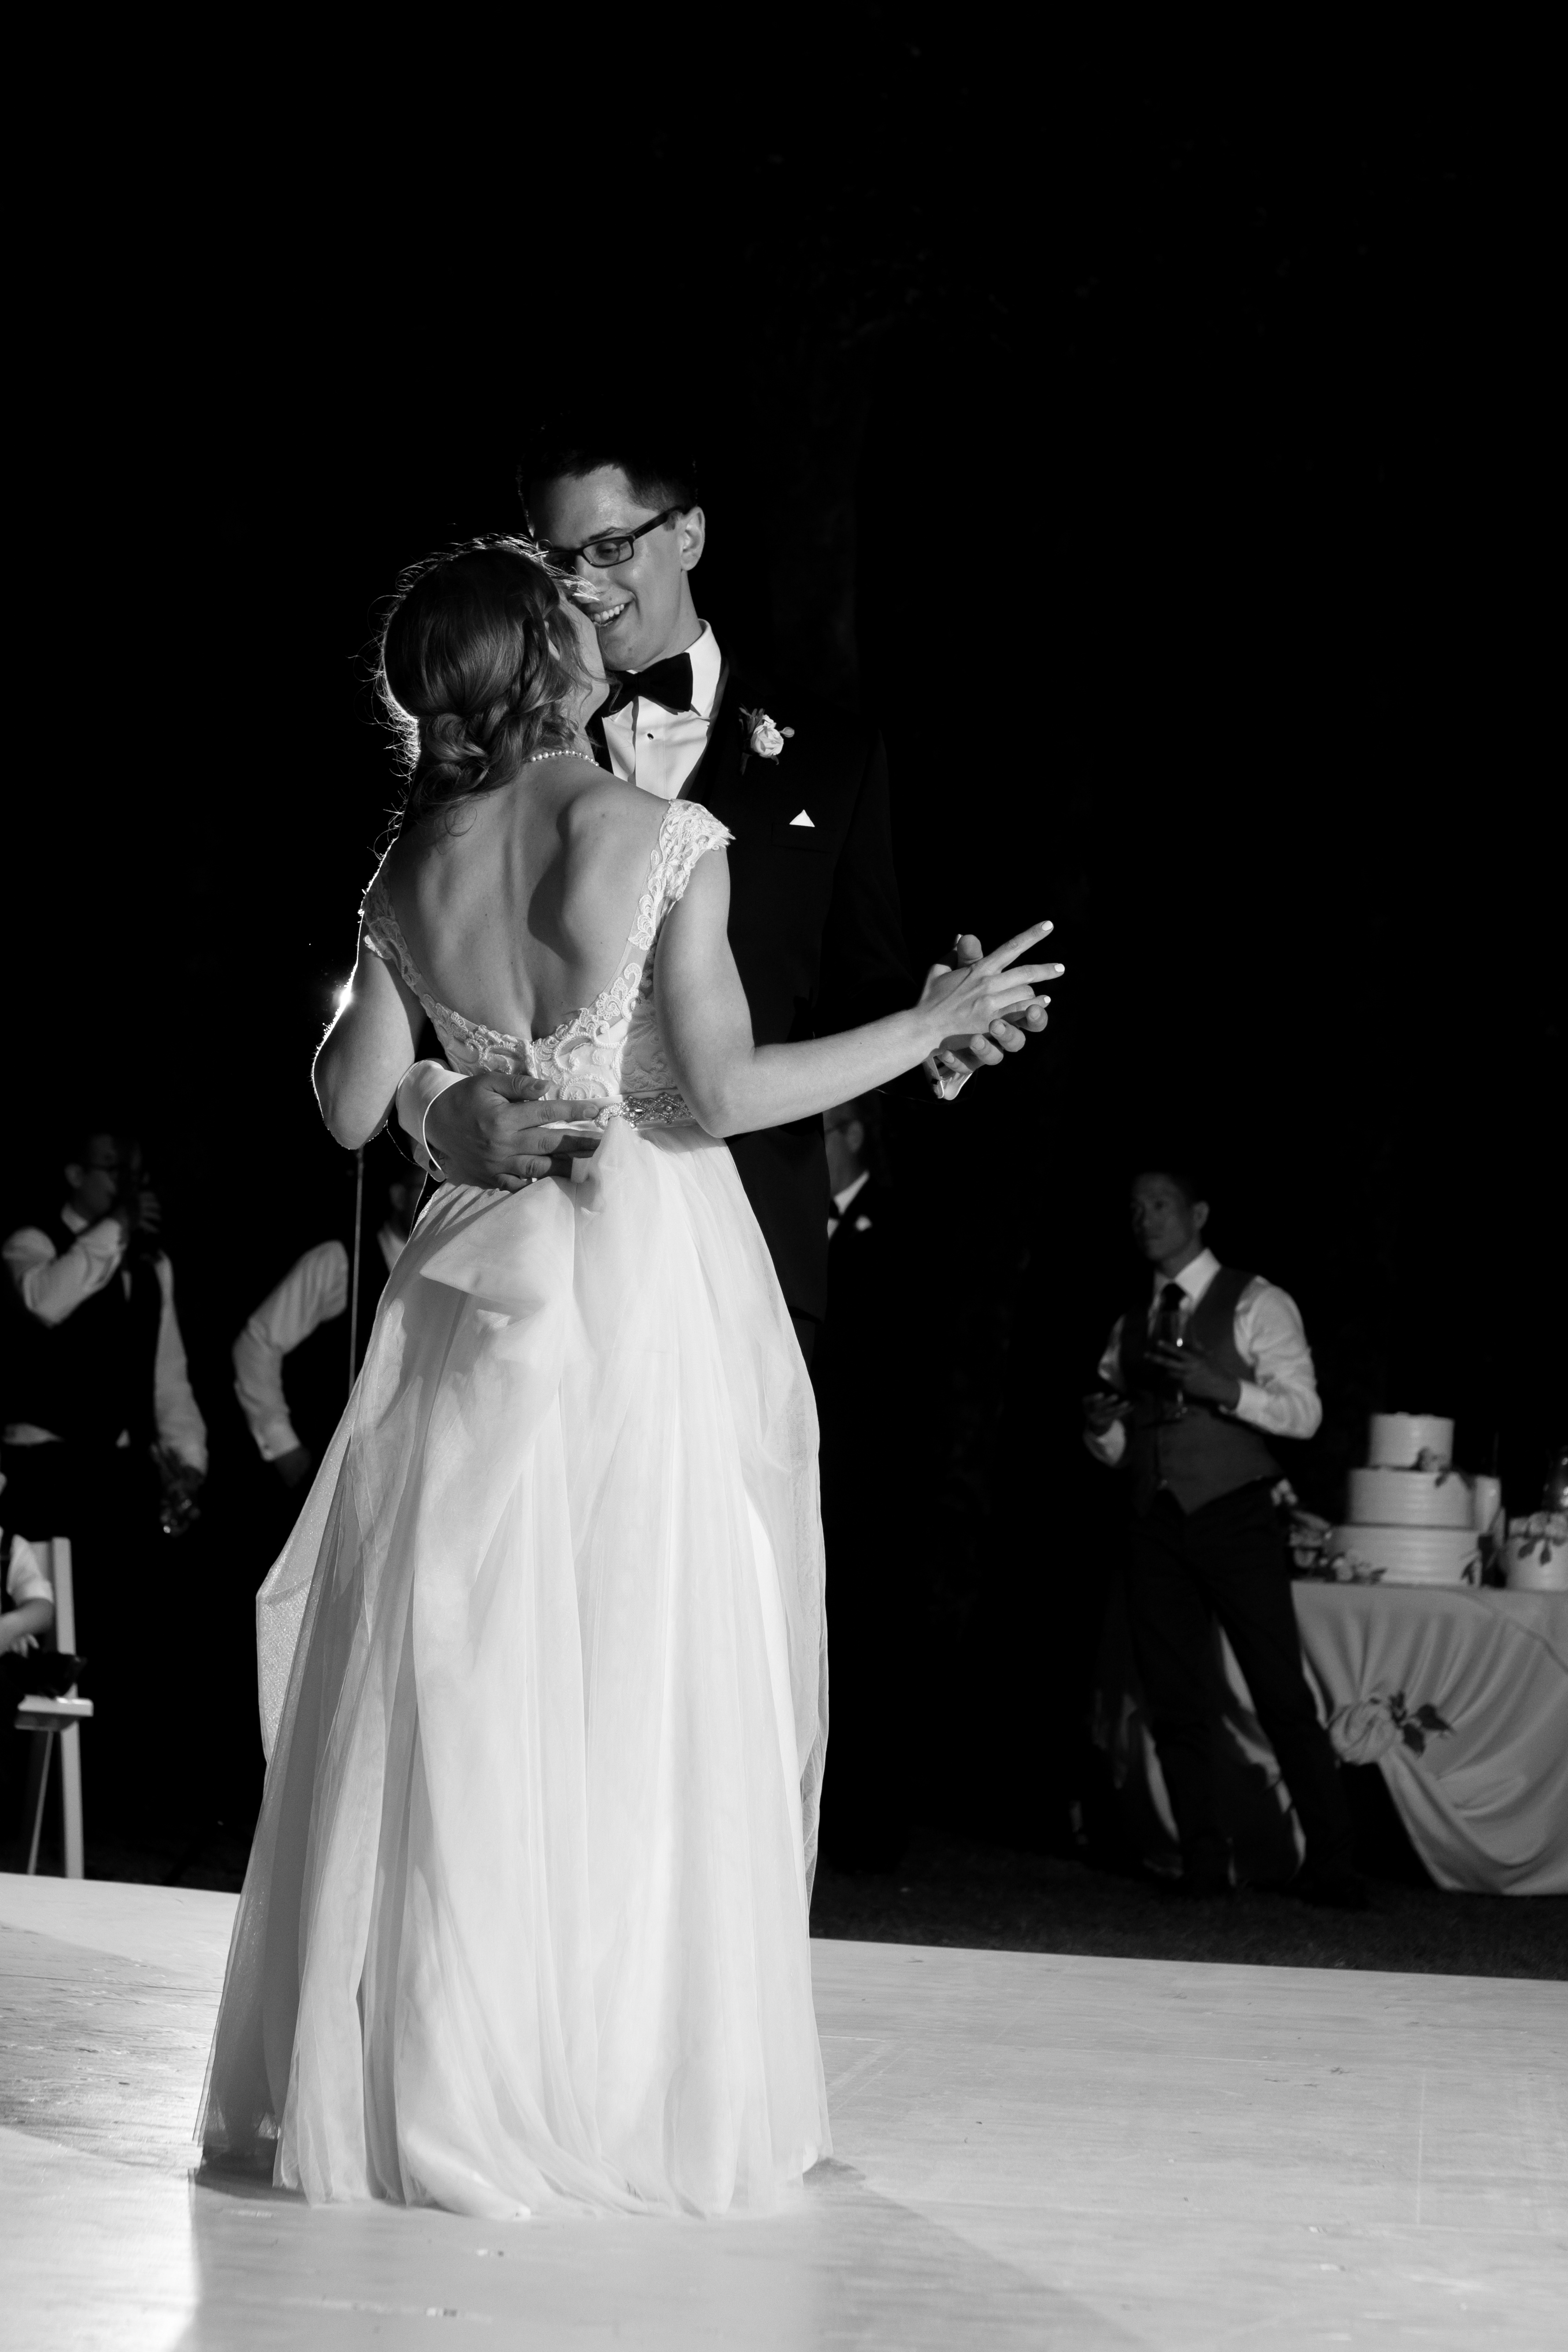 Scala Photography - First Dance